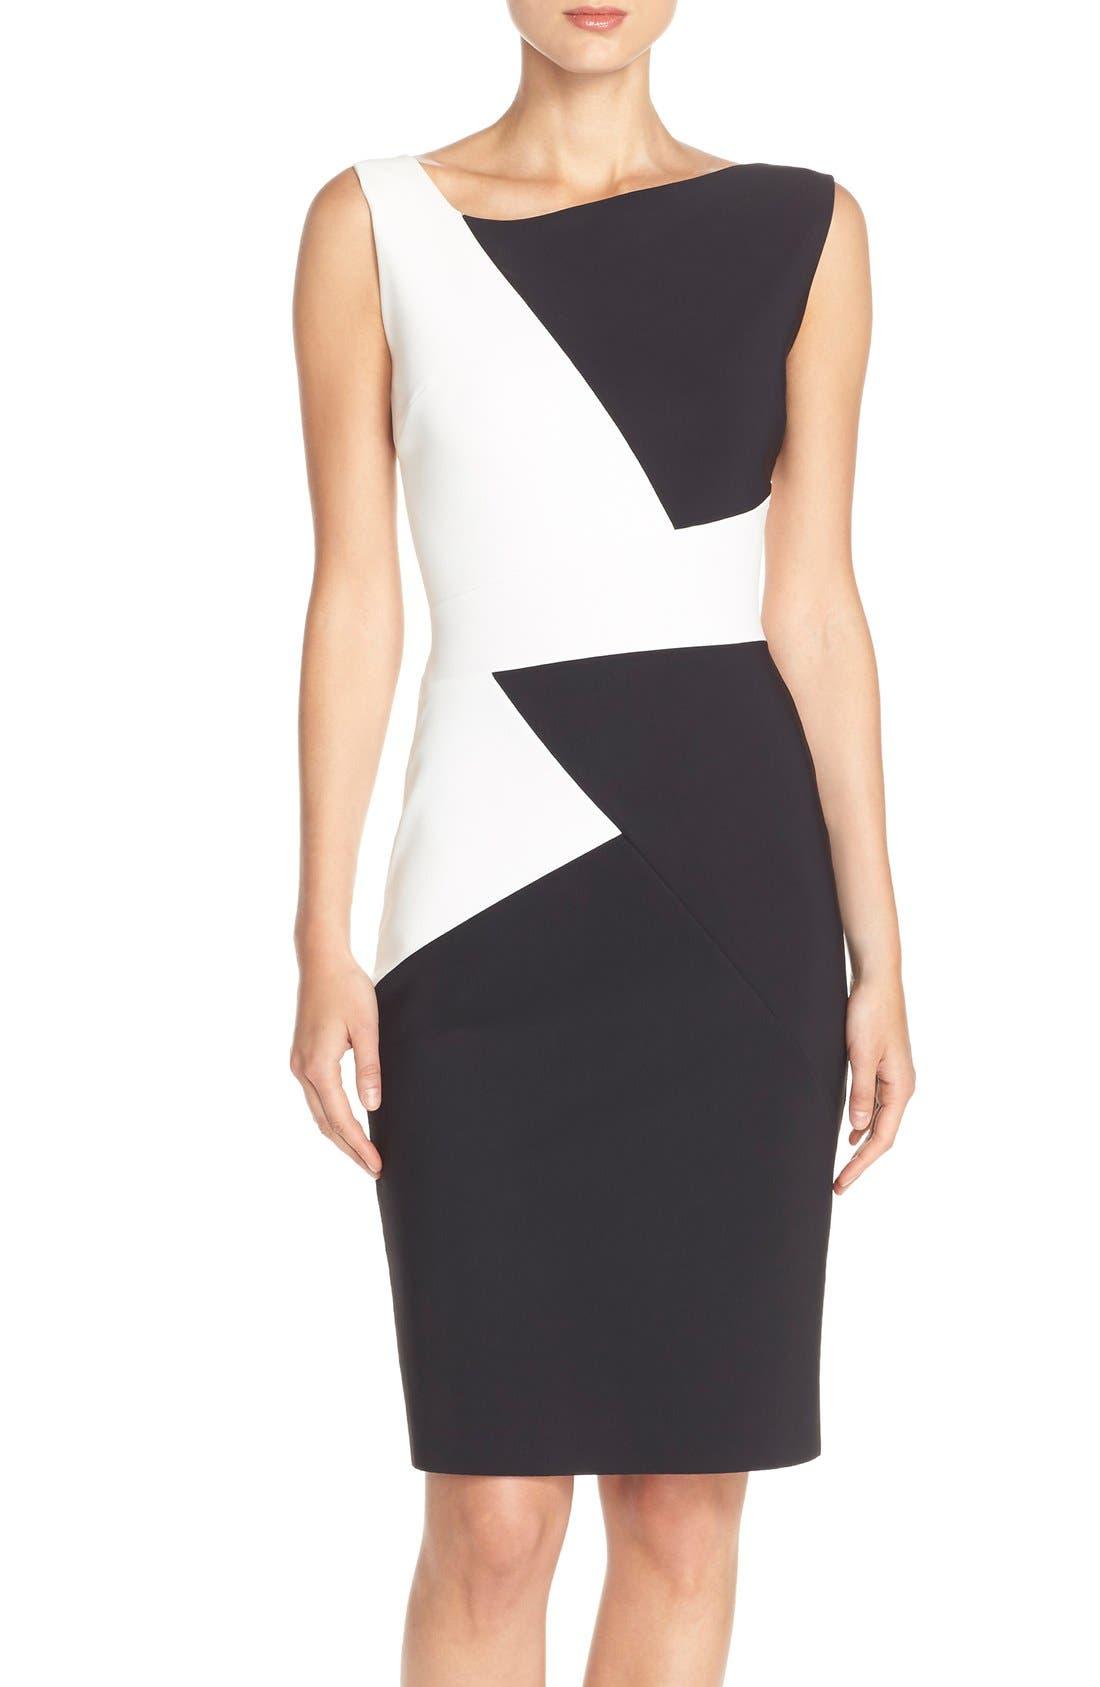 Alternate Image 1 Selected - Chiara Boni La Petite Robe 'Giustina' Colorblock Jersey Sheath Dress